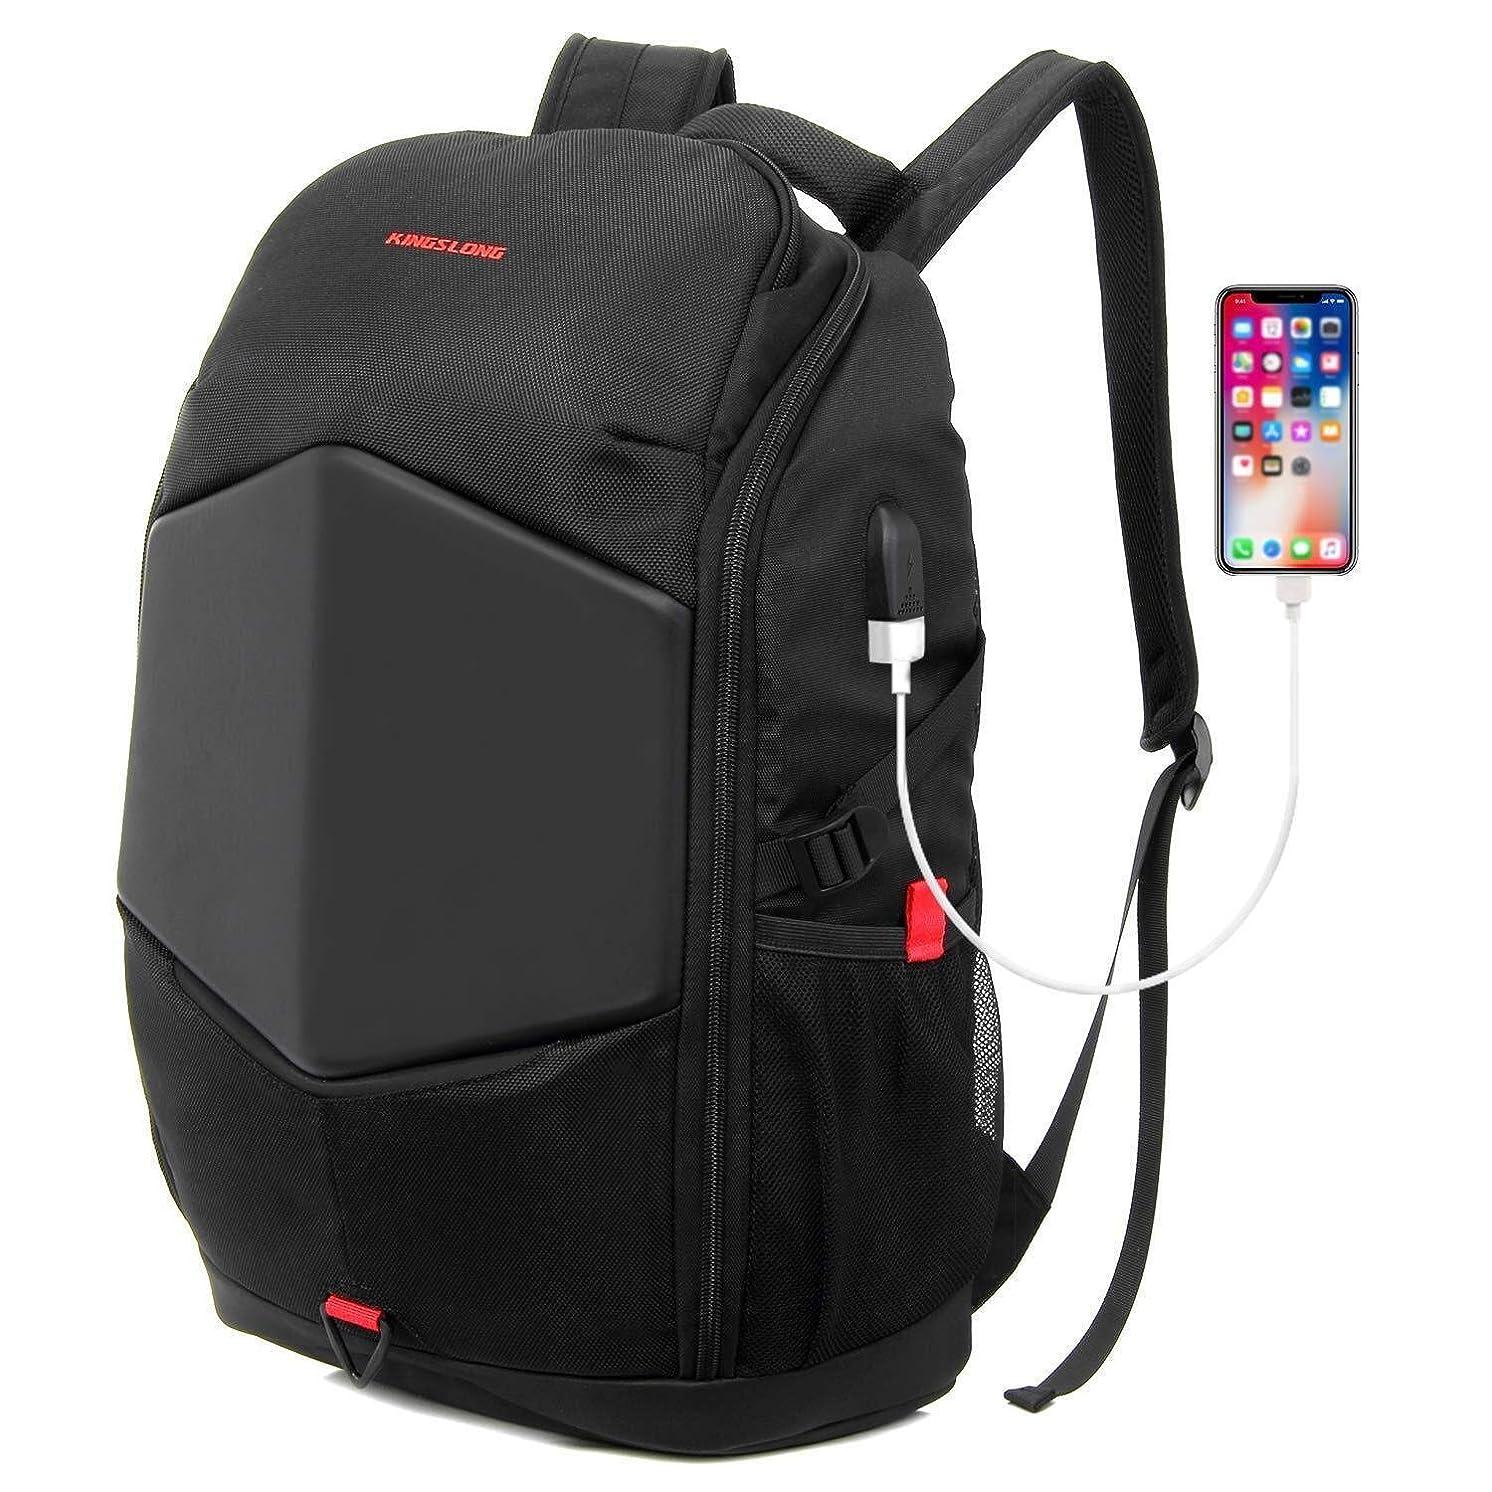 KINGLONG Laptop Backpack 17.3 inch Gaming Backpack External USB Charge Port Waterproof Business Travel Backpack Computer Bags for Men Women(Black)